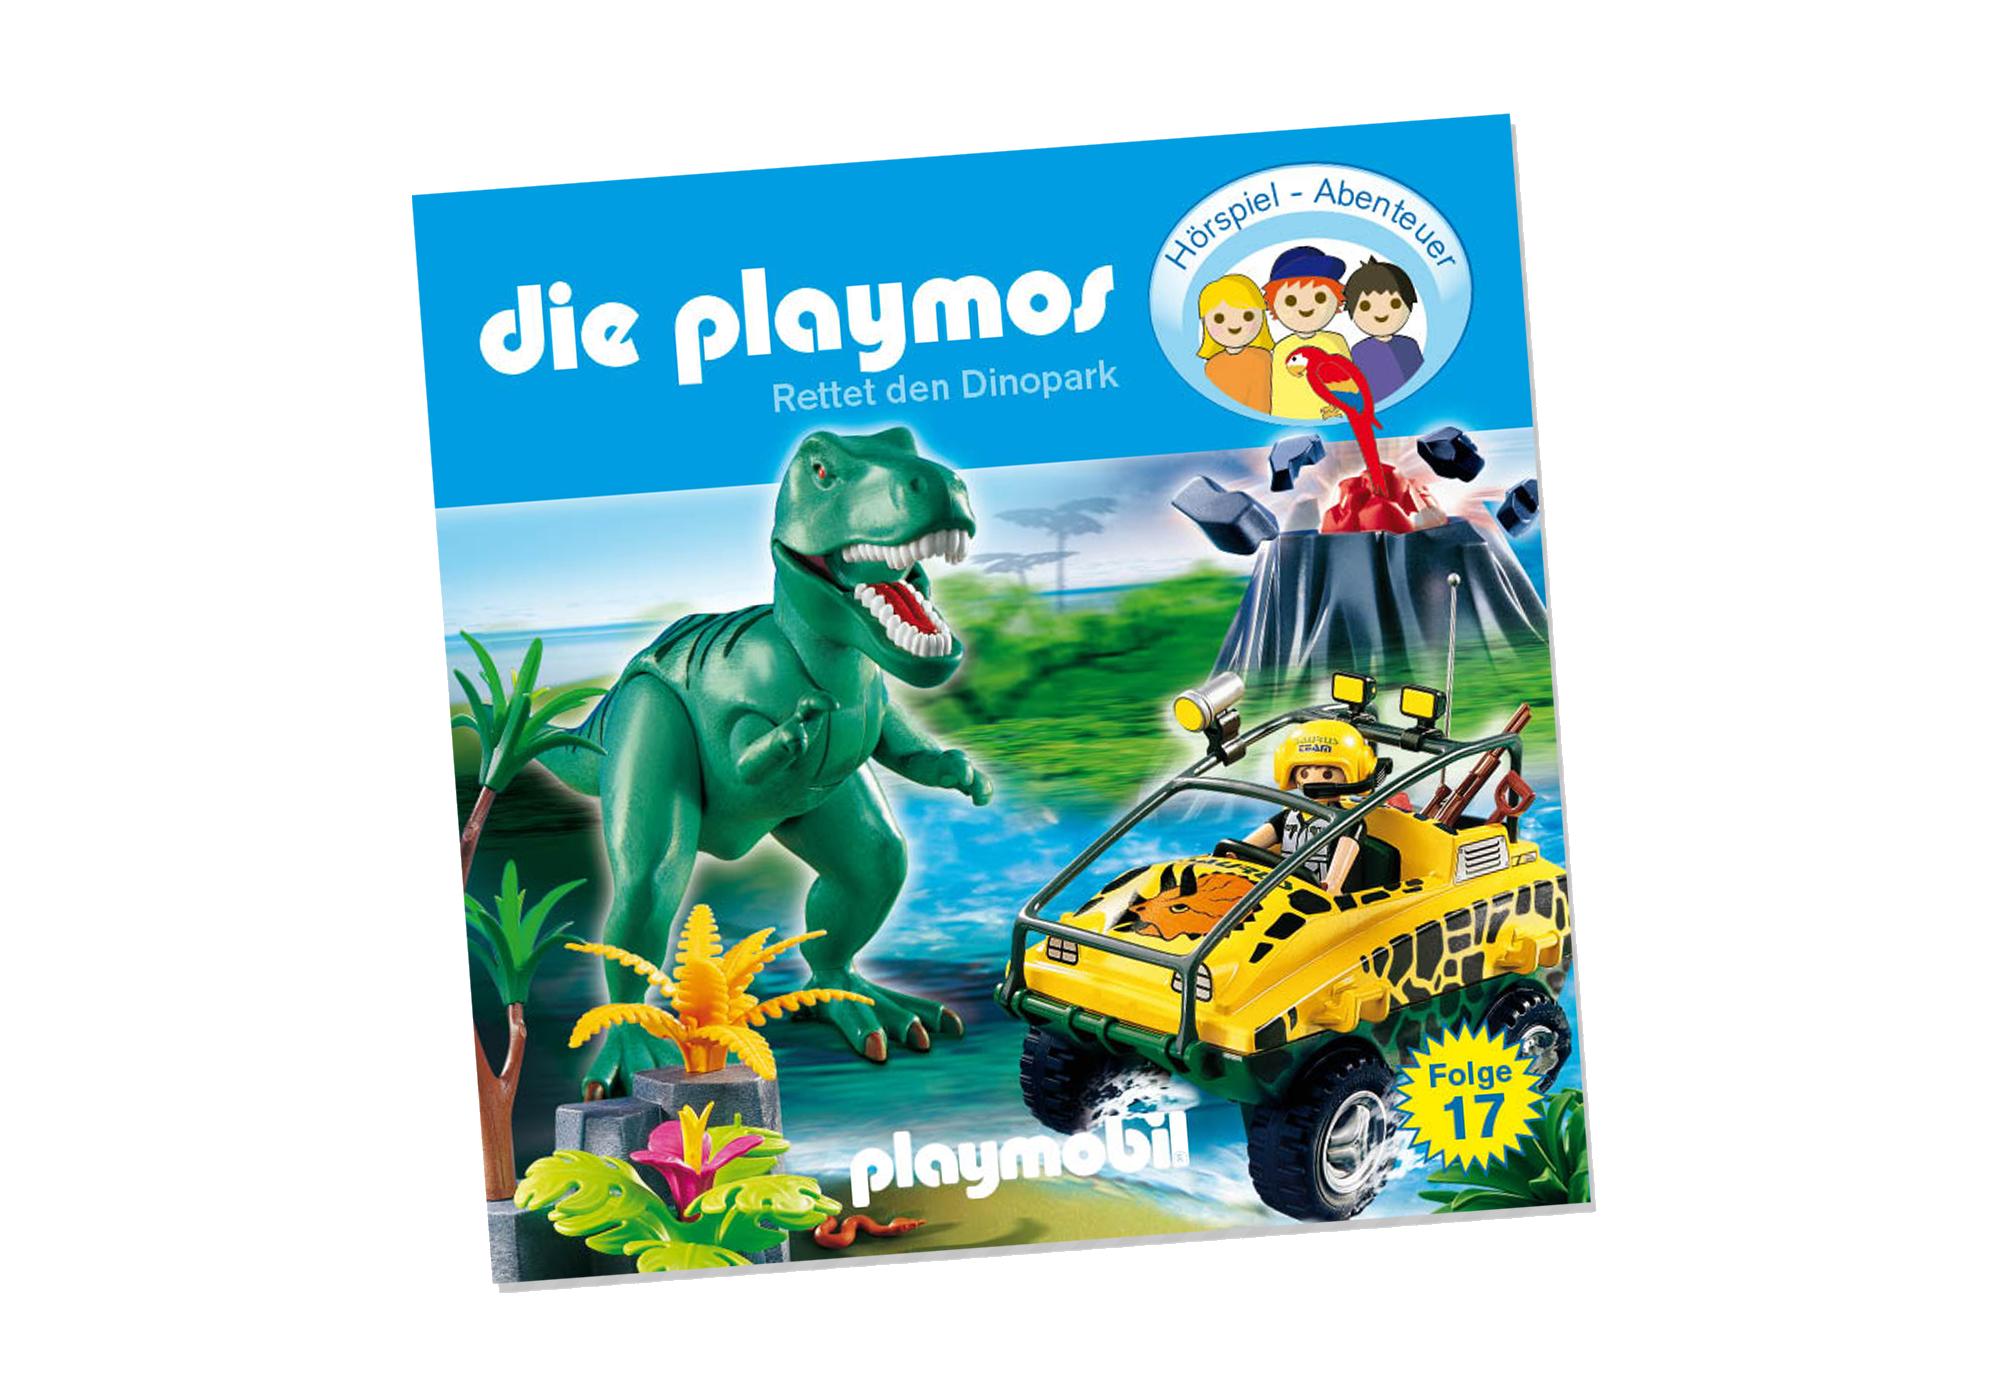 http://media.playmobil.com/i/playmobil/80270_product_detail